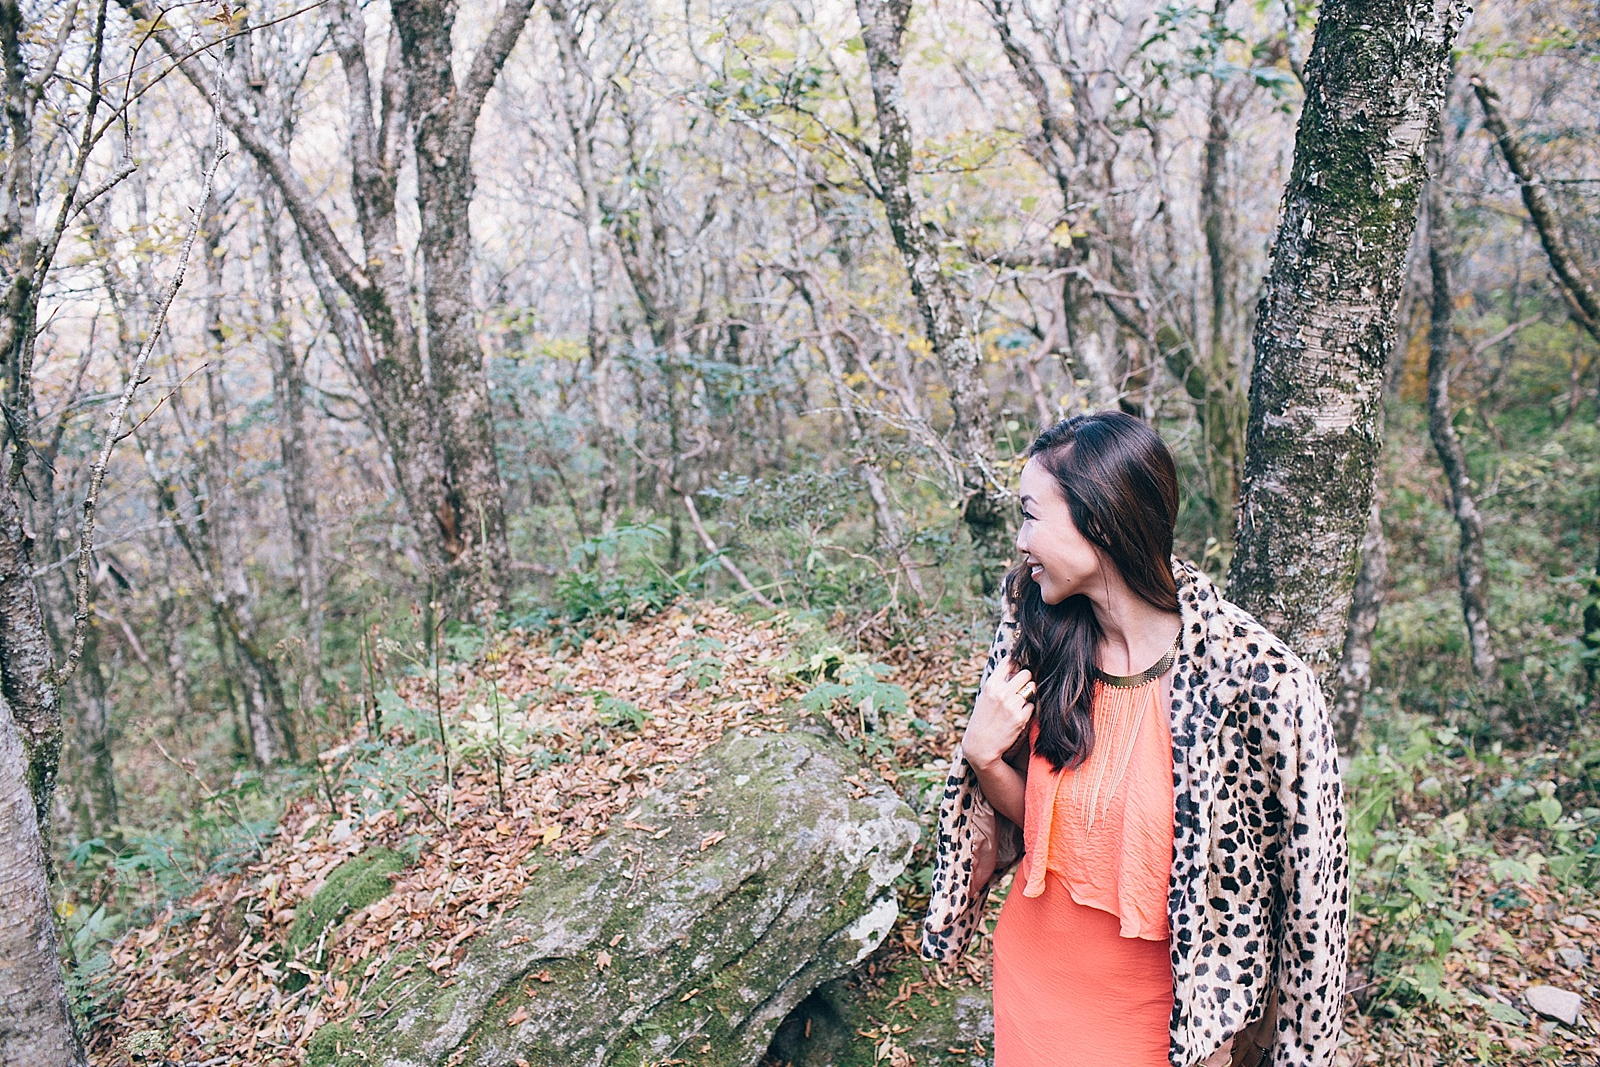 diana-elizabeth-blog-travel-fashion-blogger-north-carolina-wedding-elopement-craggy-pinnacle-trail_0003